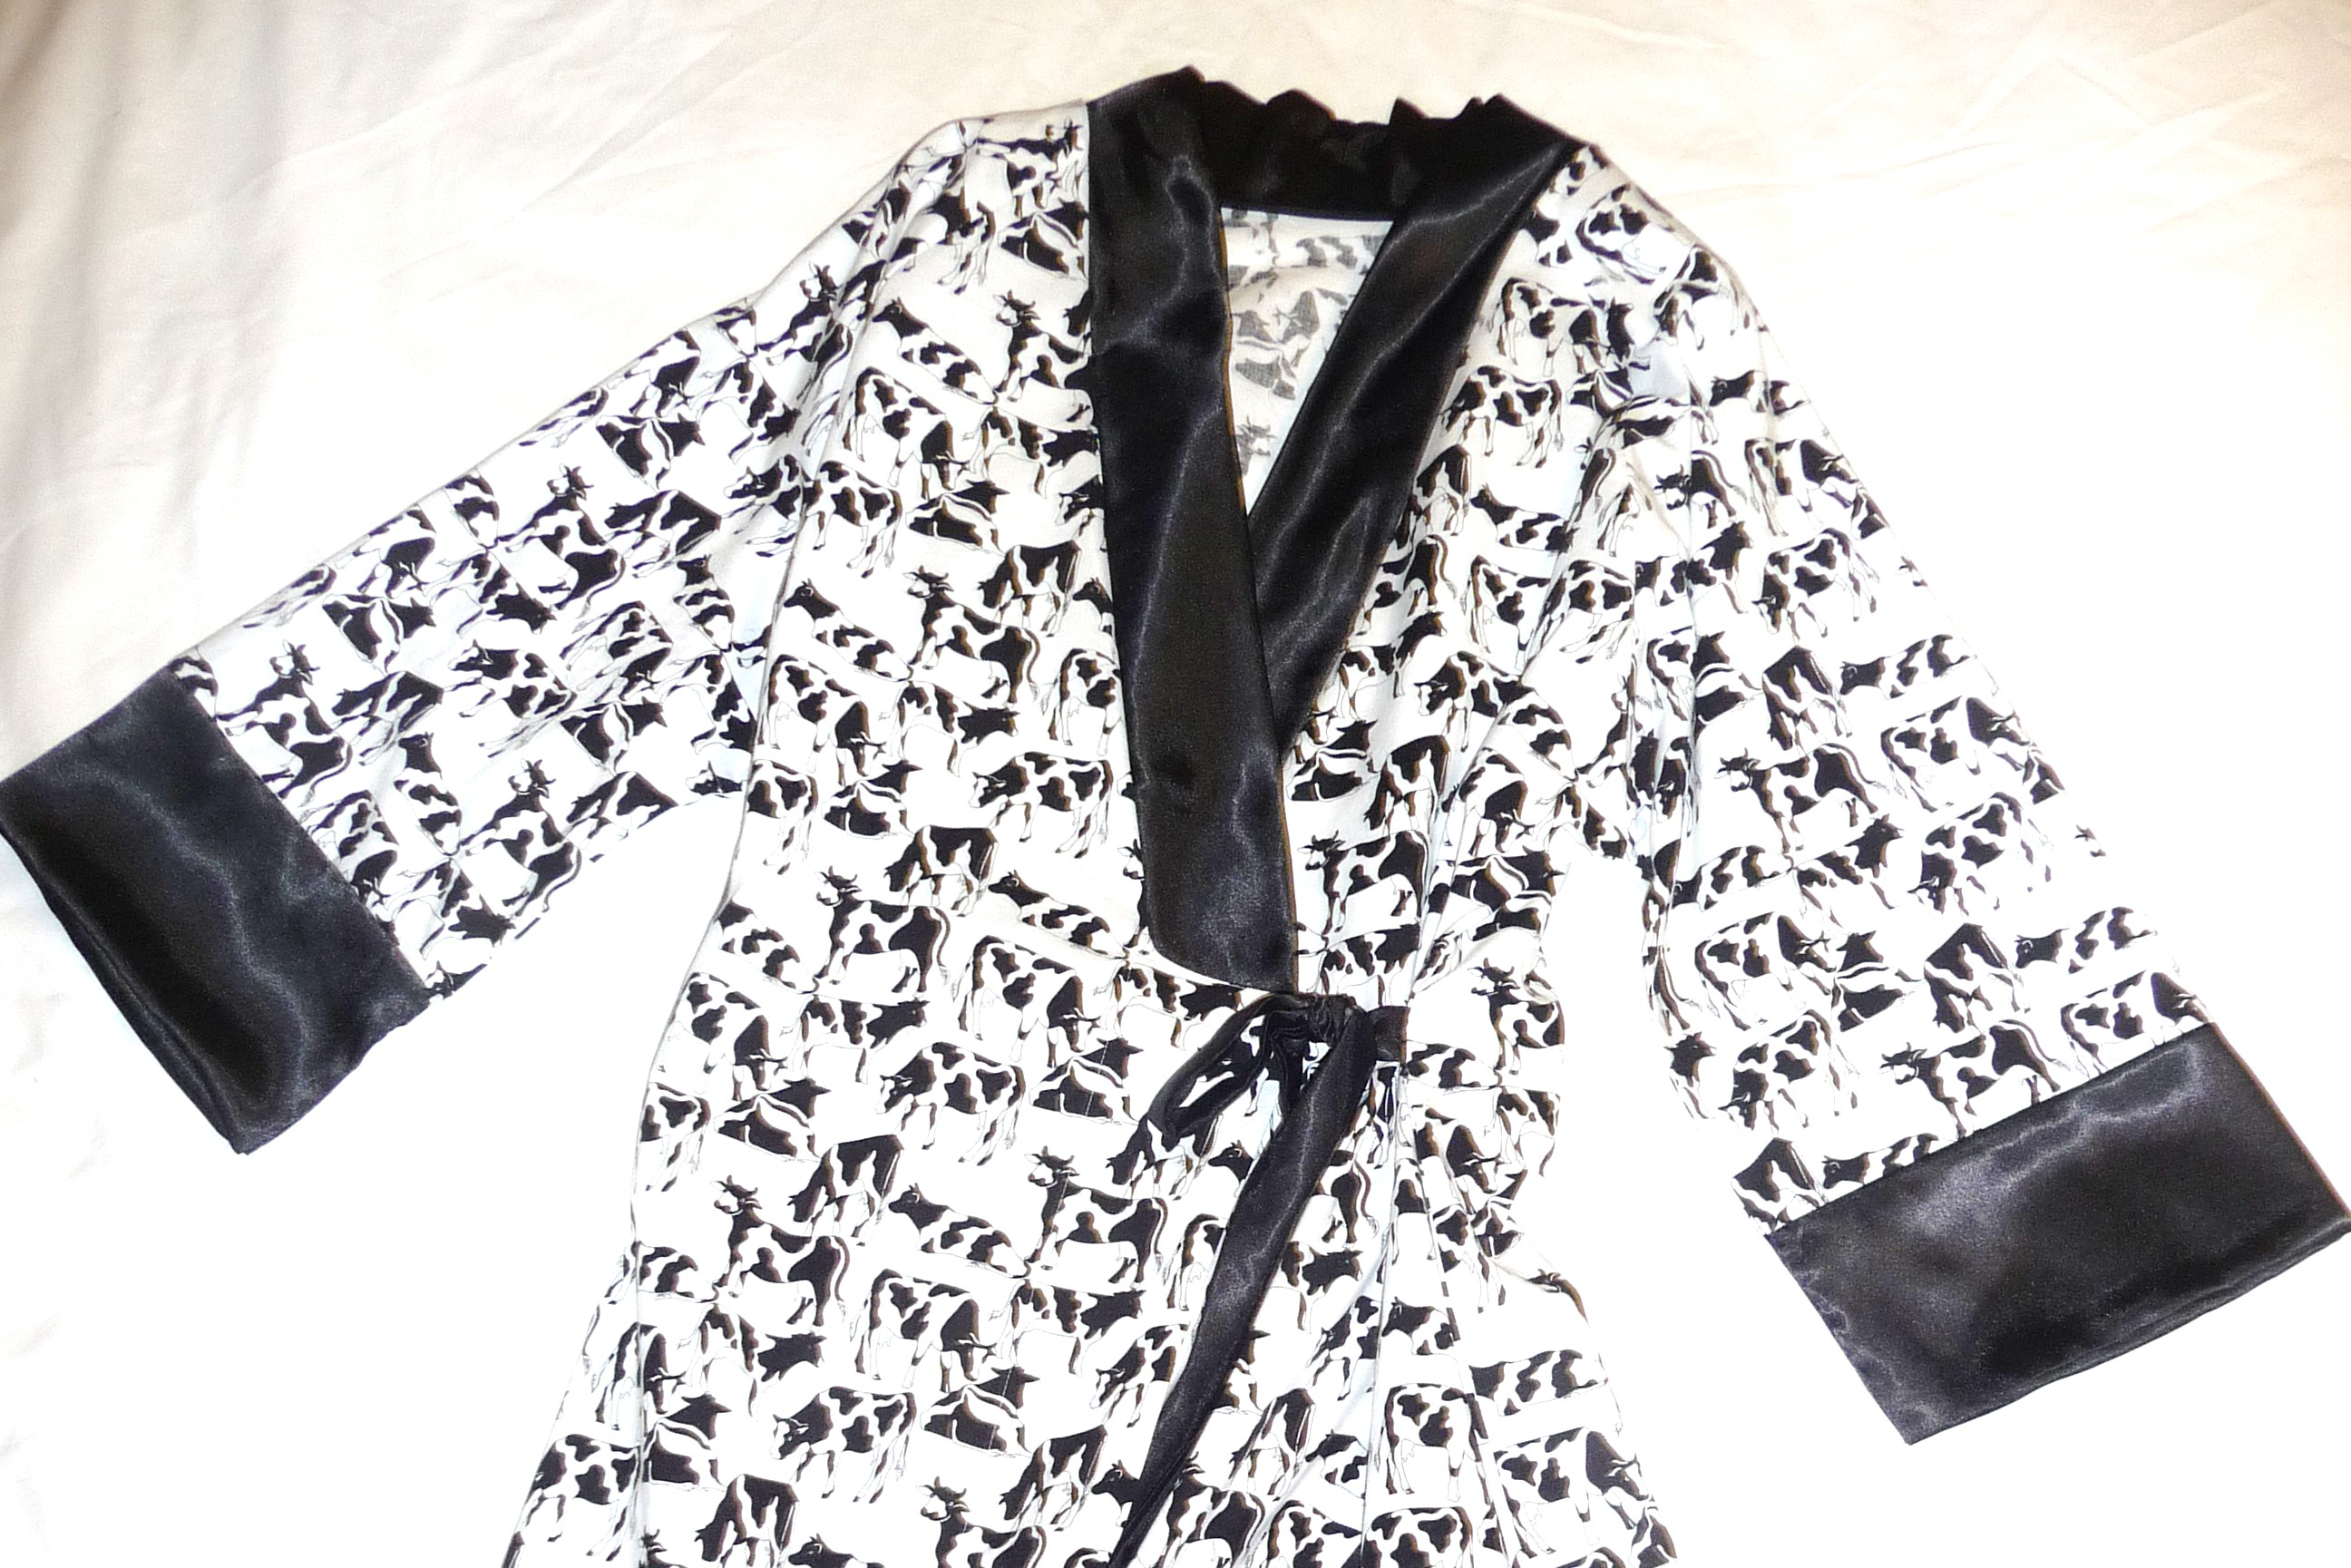 How Now Black+White Cow? « CherryPix : SewingPix